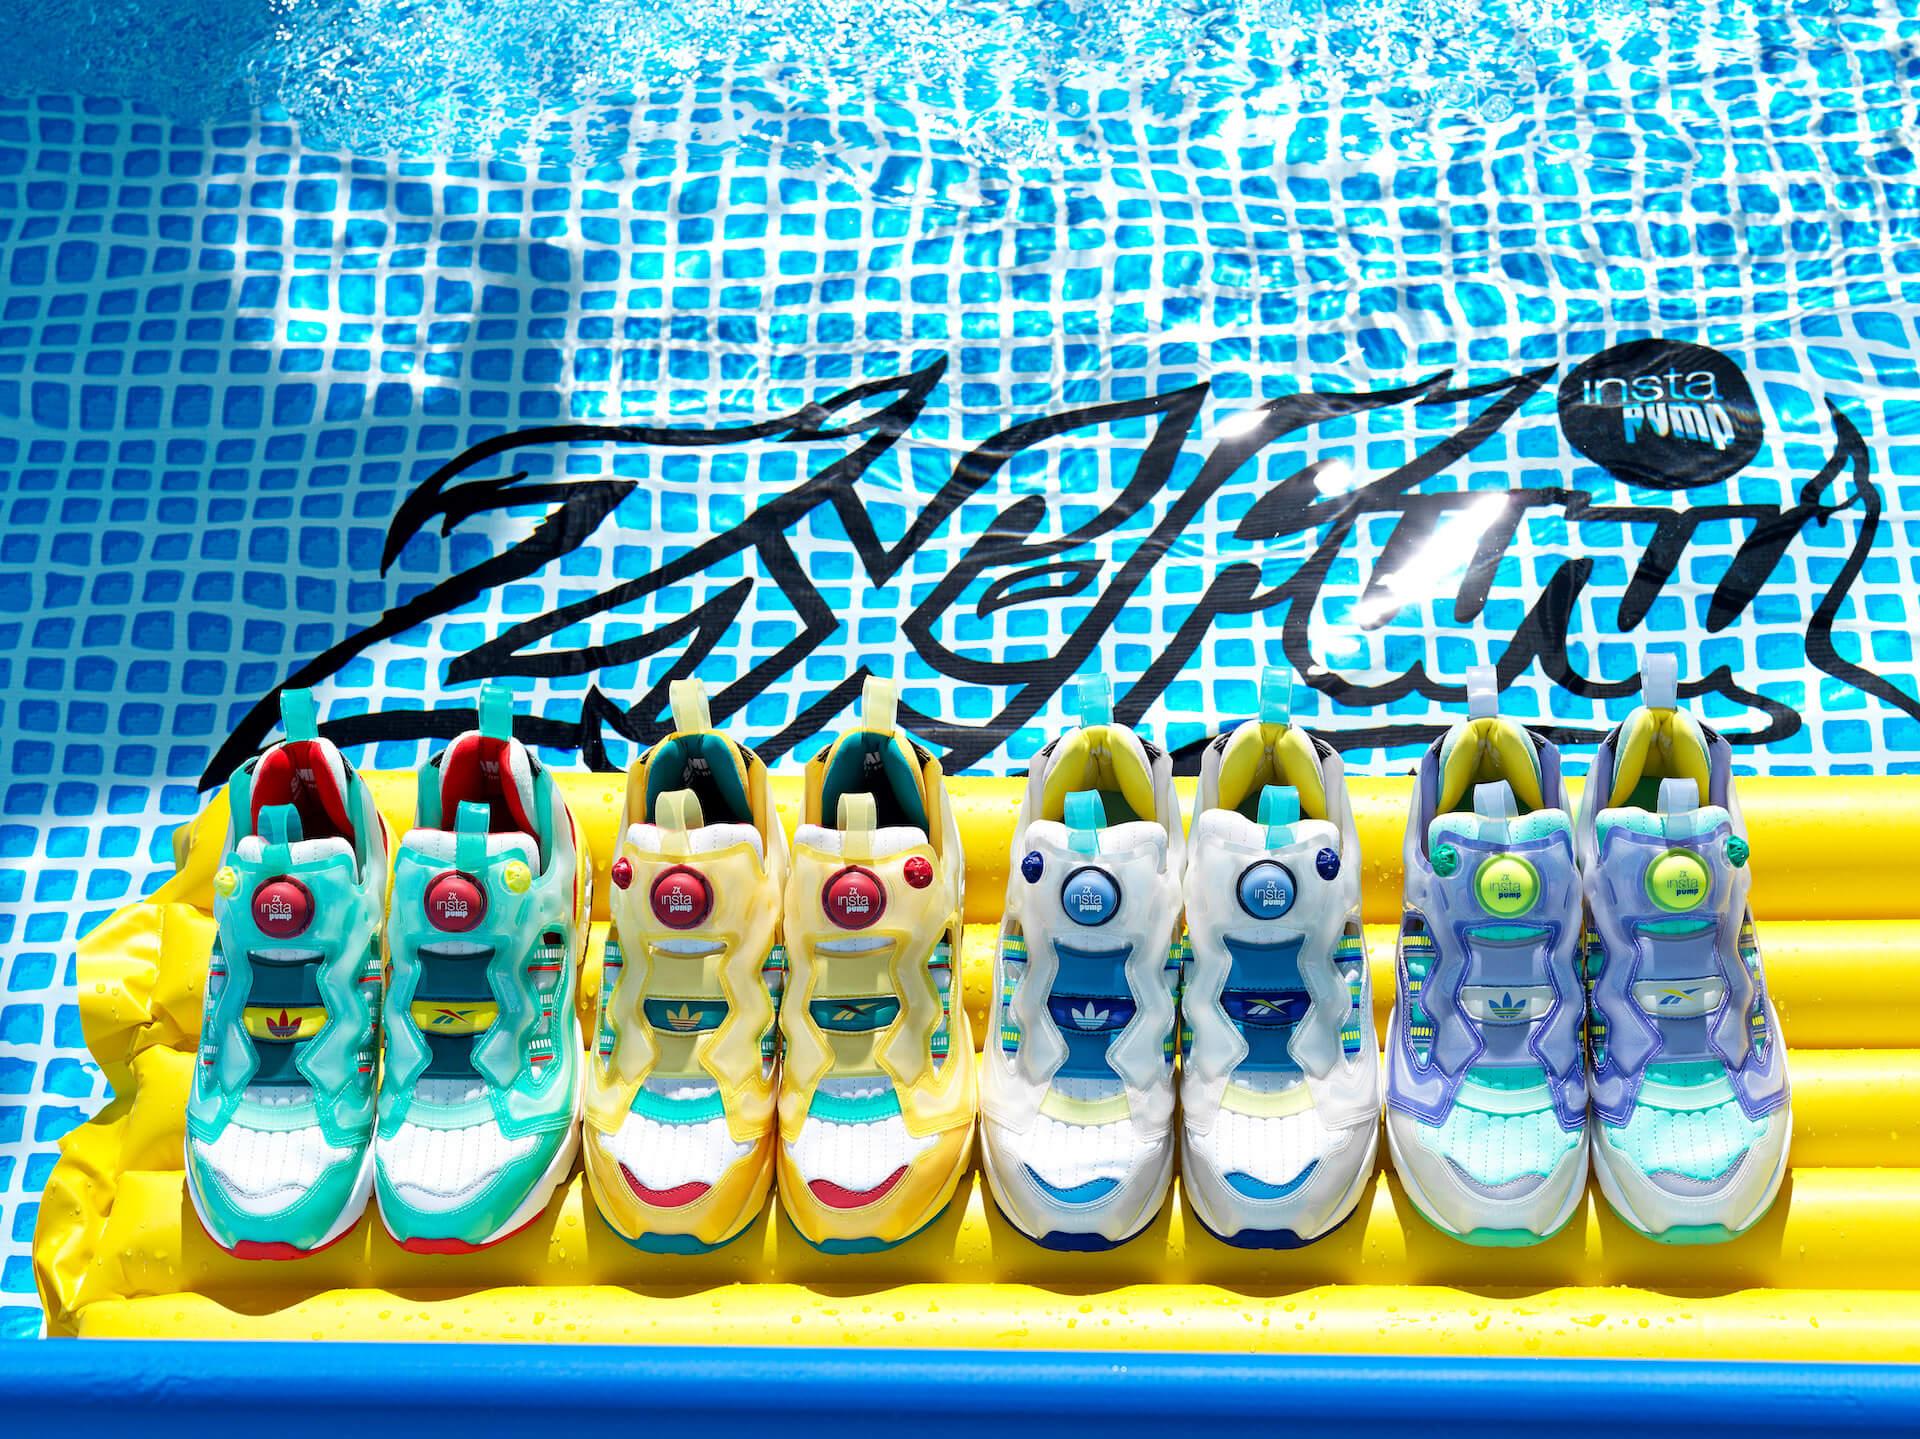 adidas OriginalsとReebokのコラボモデル「ZX FURY」に夏にぴったりの新色4色が登場! life210719_adidasoriginals_reebok_18